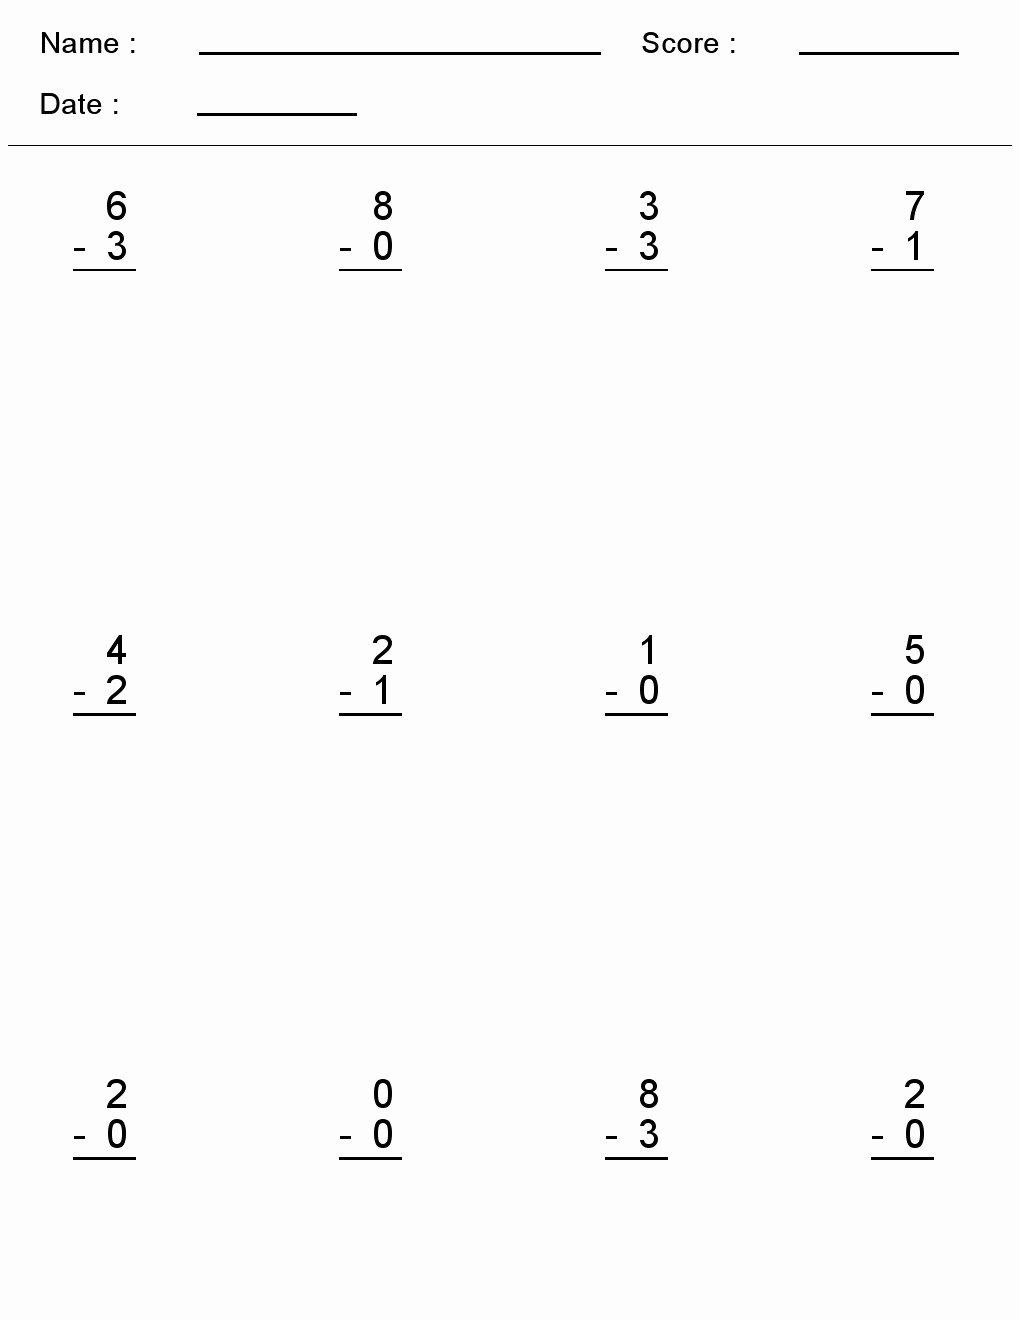 Simple Addition and Subtraction Worksheets for Preschoolers Best Of Kindergarten Worksheets Maths Subtraction E Digit Simple